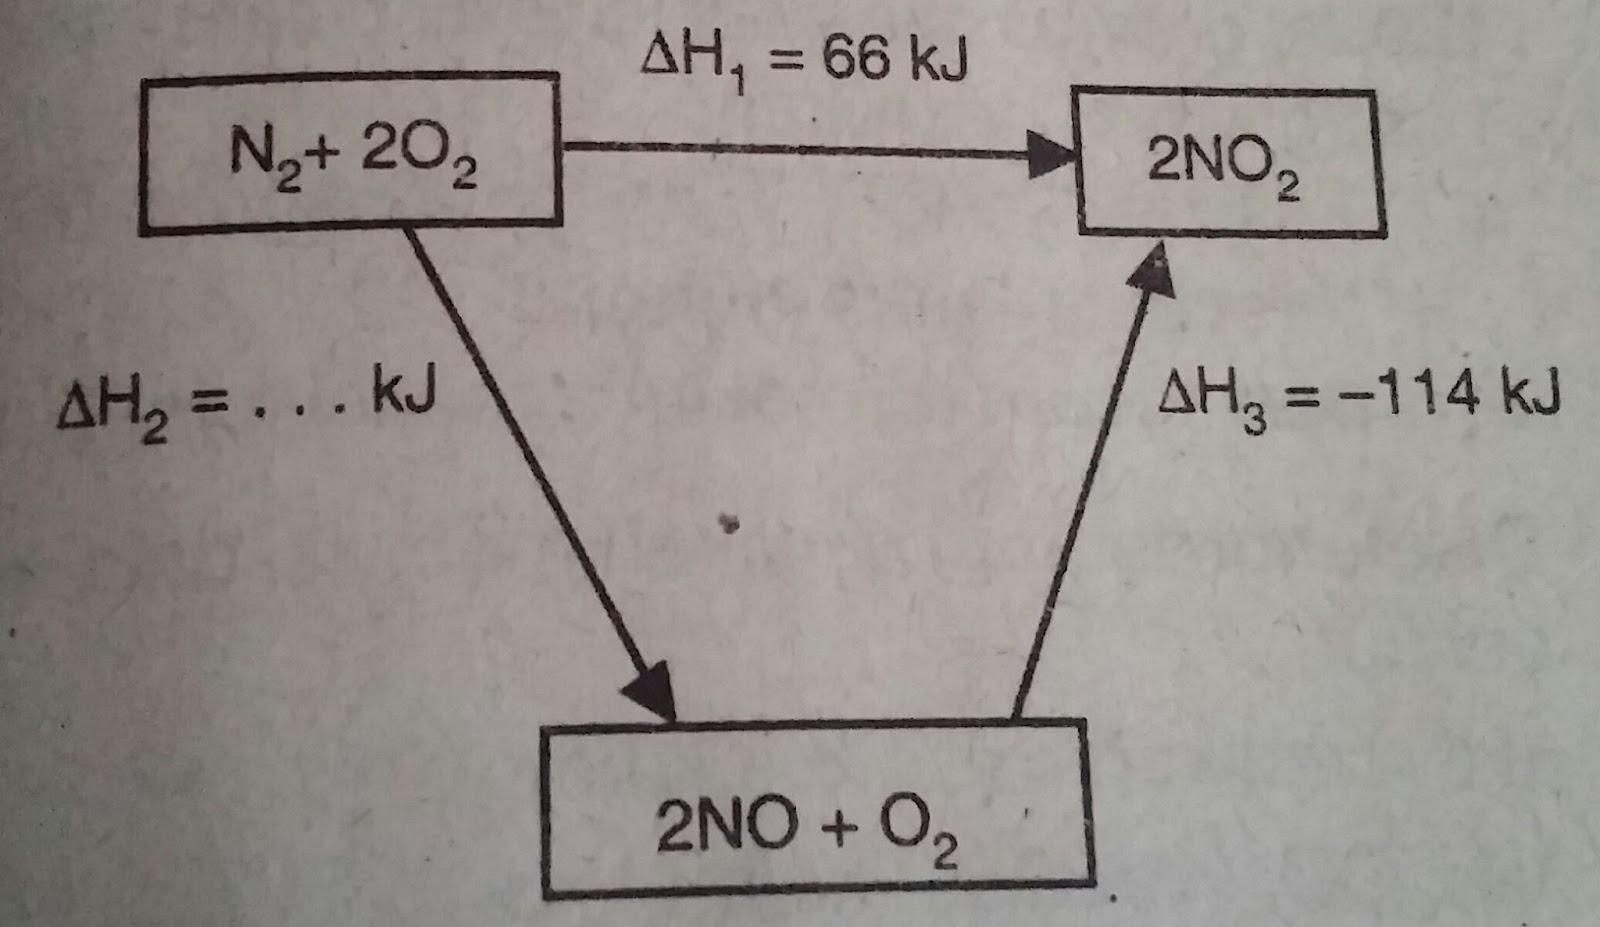 Soal kimia kelas 11 sma tentang menentukan harga perubahan entalpi perhatikan diagram berikut ccuart Choice Image